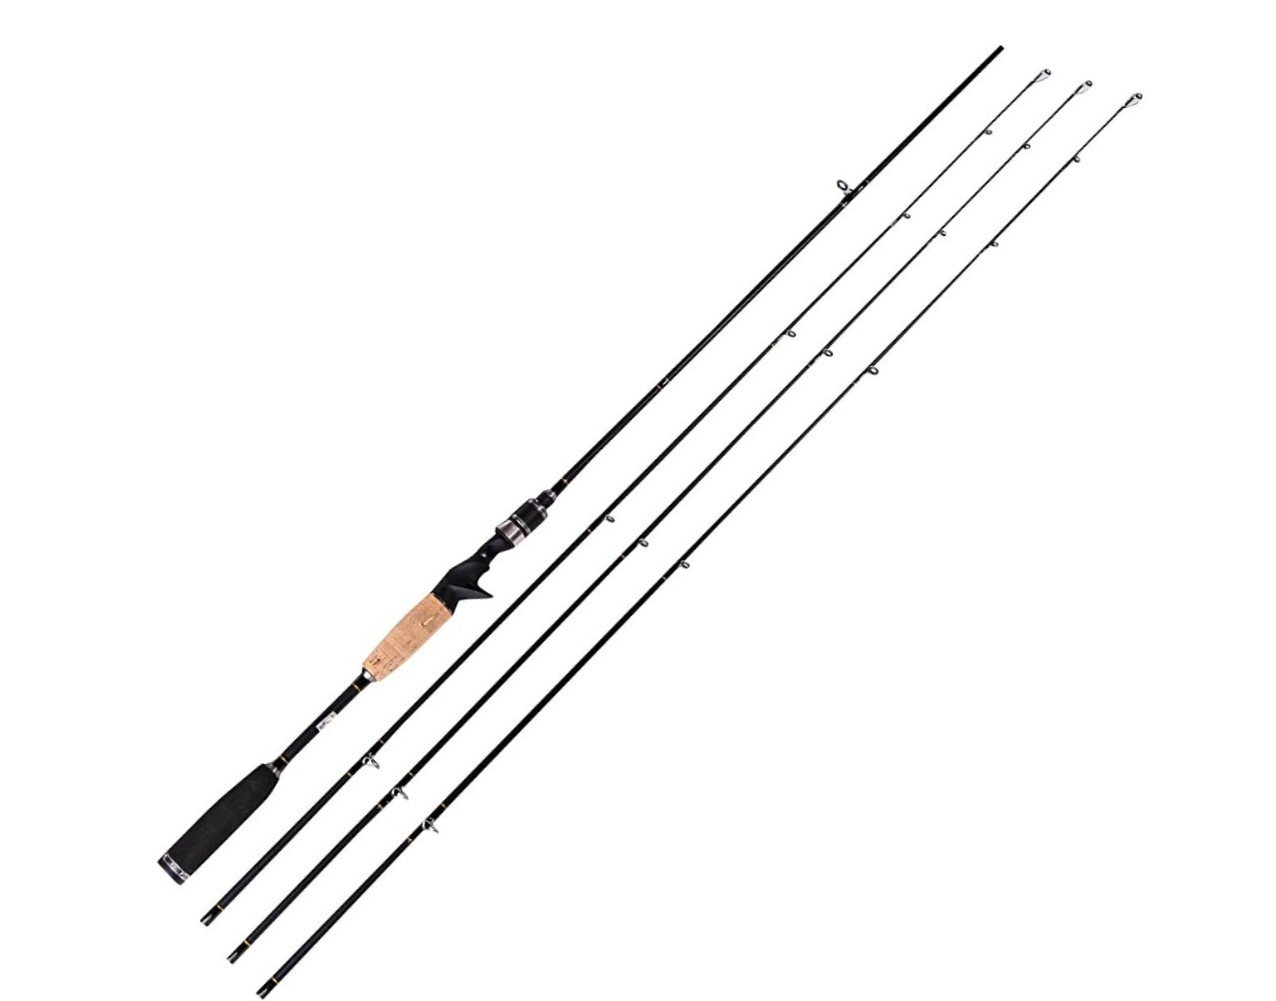 Entsport E Series - Rattlesnake 2-Piece 7-Feet Casting Rod with 3 Top Pieces Graphite Baitcasting Fishing Rod Portable Baitcast Rod Baitcaster (Medium Heavy, Medium and Medium Light)